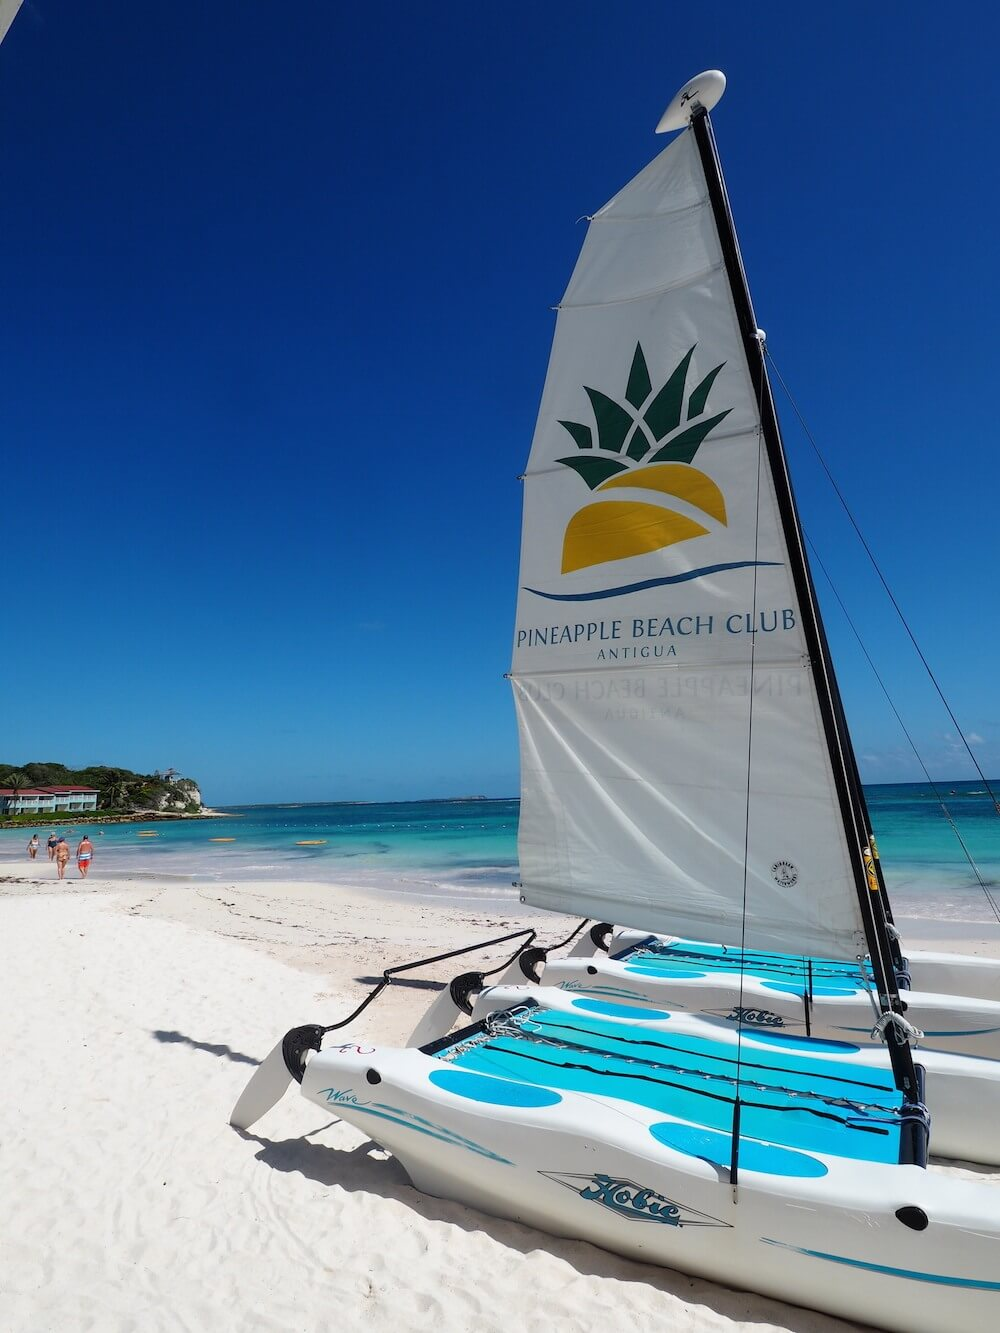 Pineapple-Beach-Club on the beach